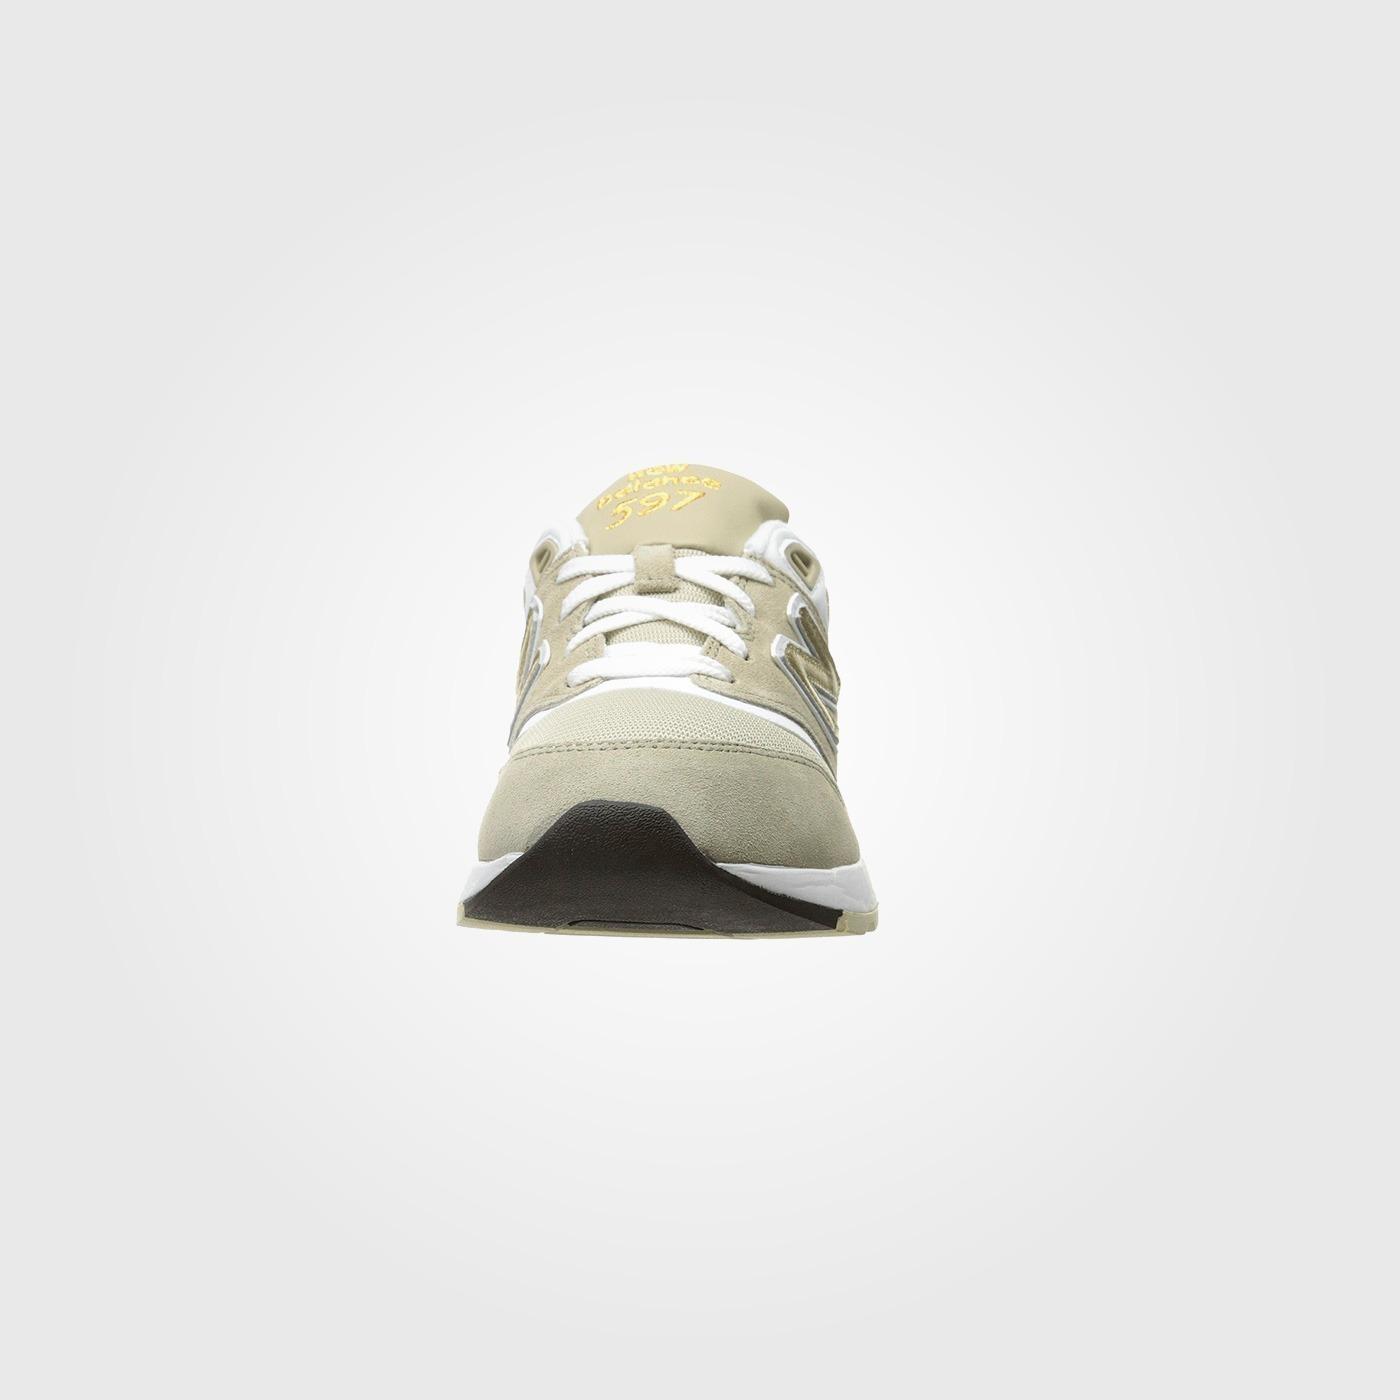 Кроссовки New Balance Classics ML597 Trench/White